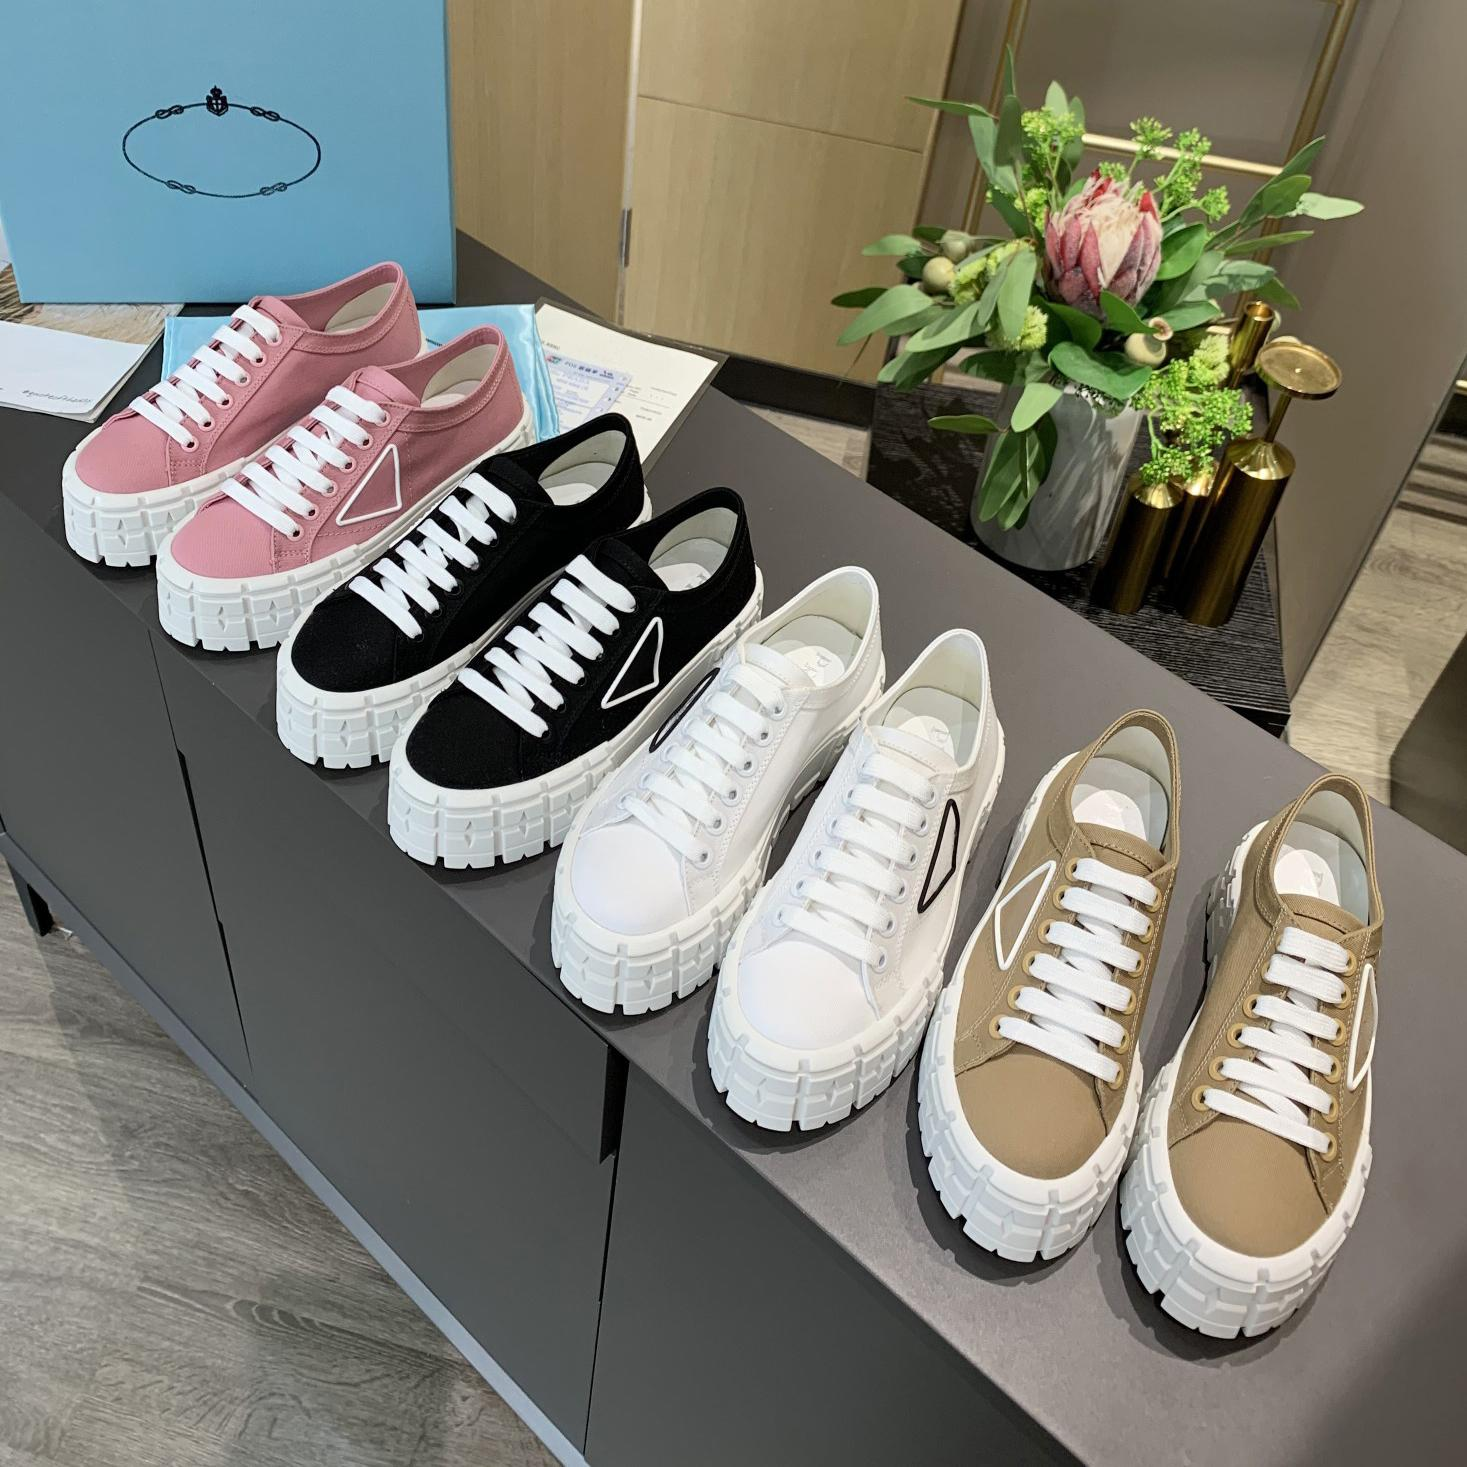 Frauen Nylon Niedrig Tops Gabardine Sneakers Rad Cassetta Stylisy Schuh Dame Mode Casual Schuhe Triple Black Whith Leinwand Platform Sneaker